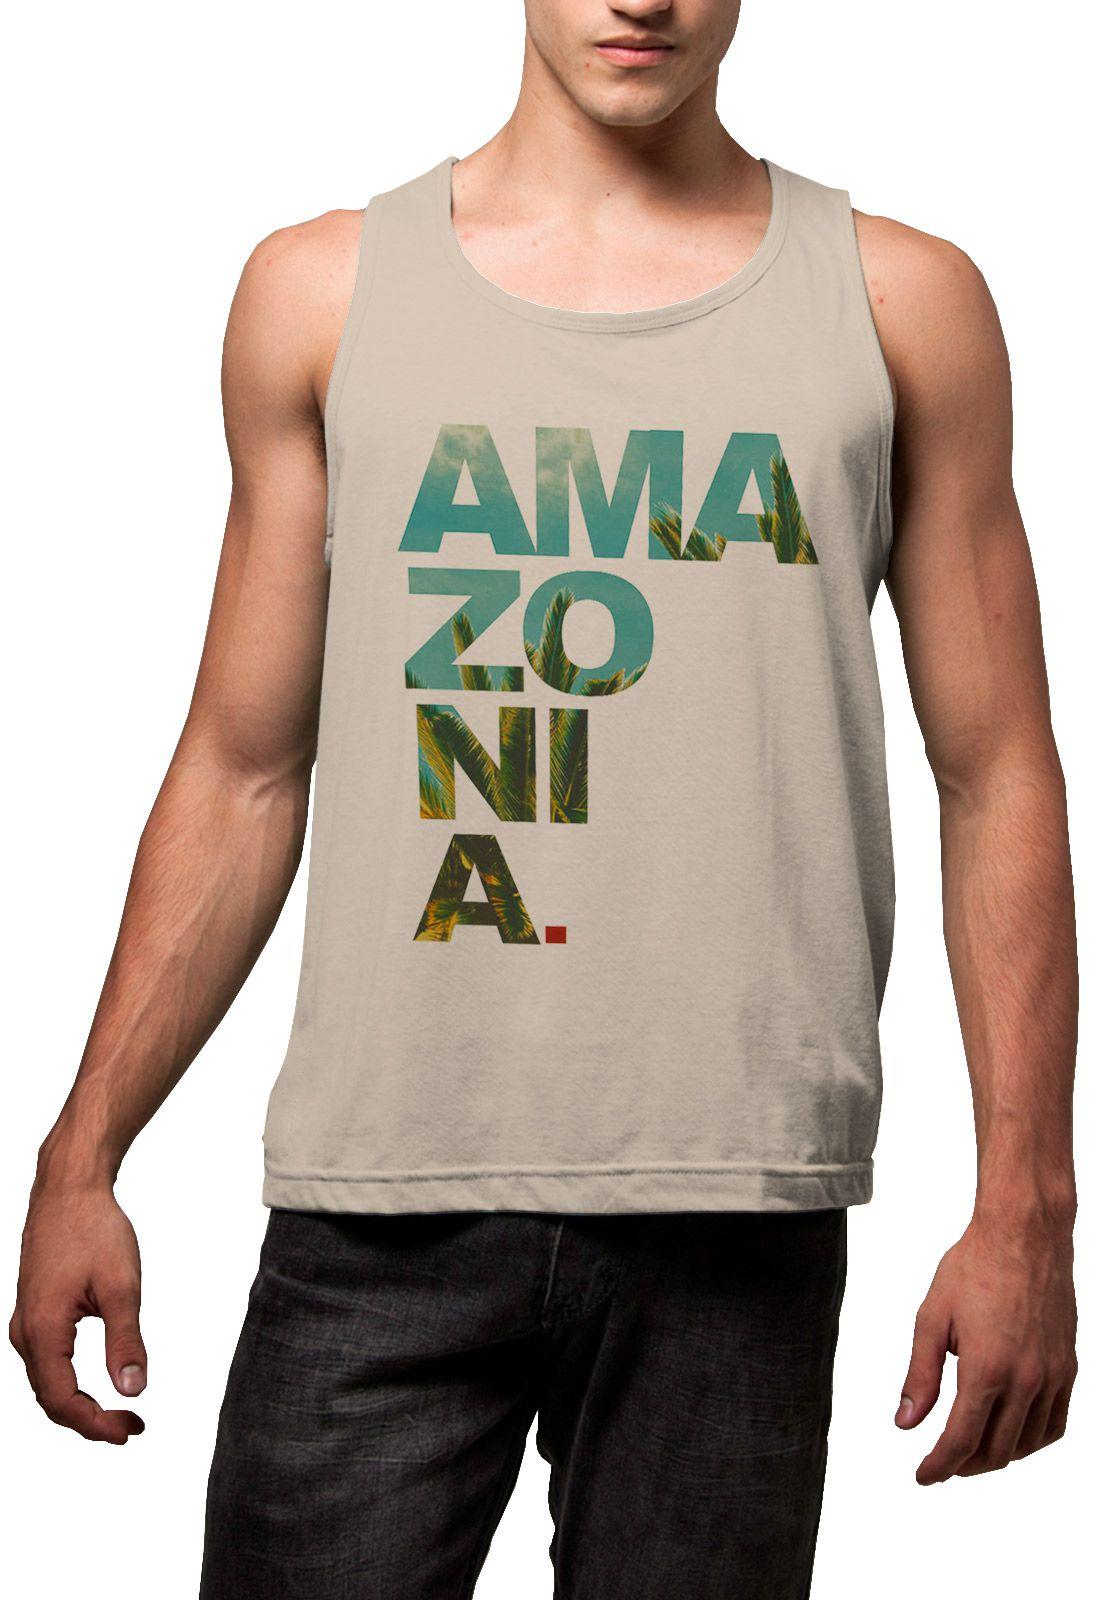 Regata Amazônia Ama zo ni a - Bege